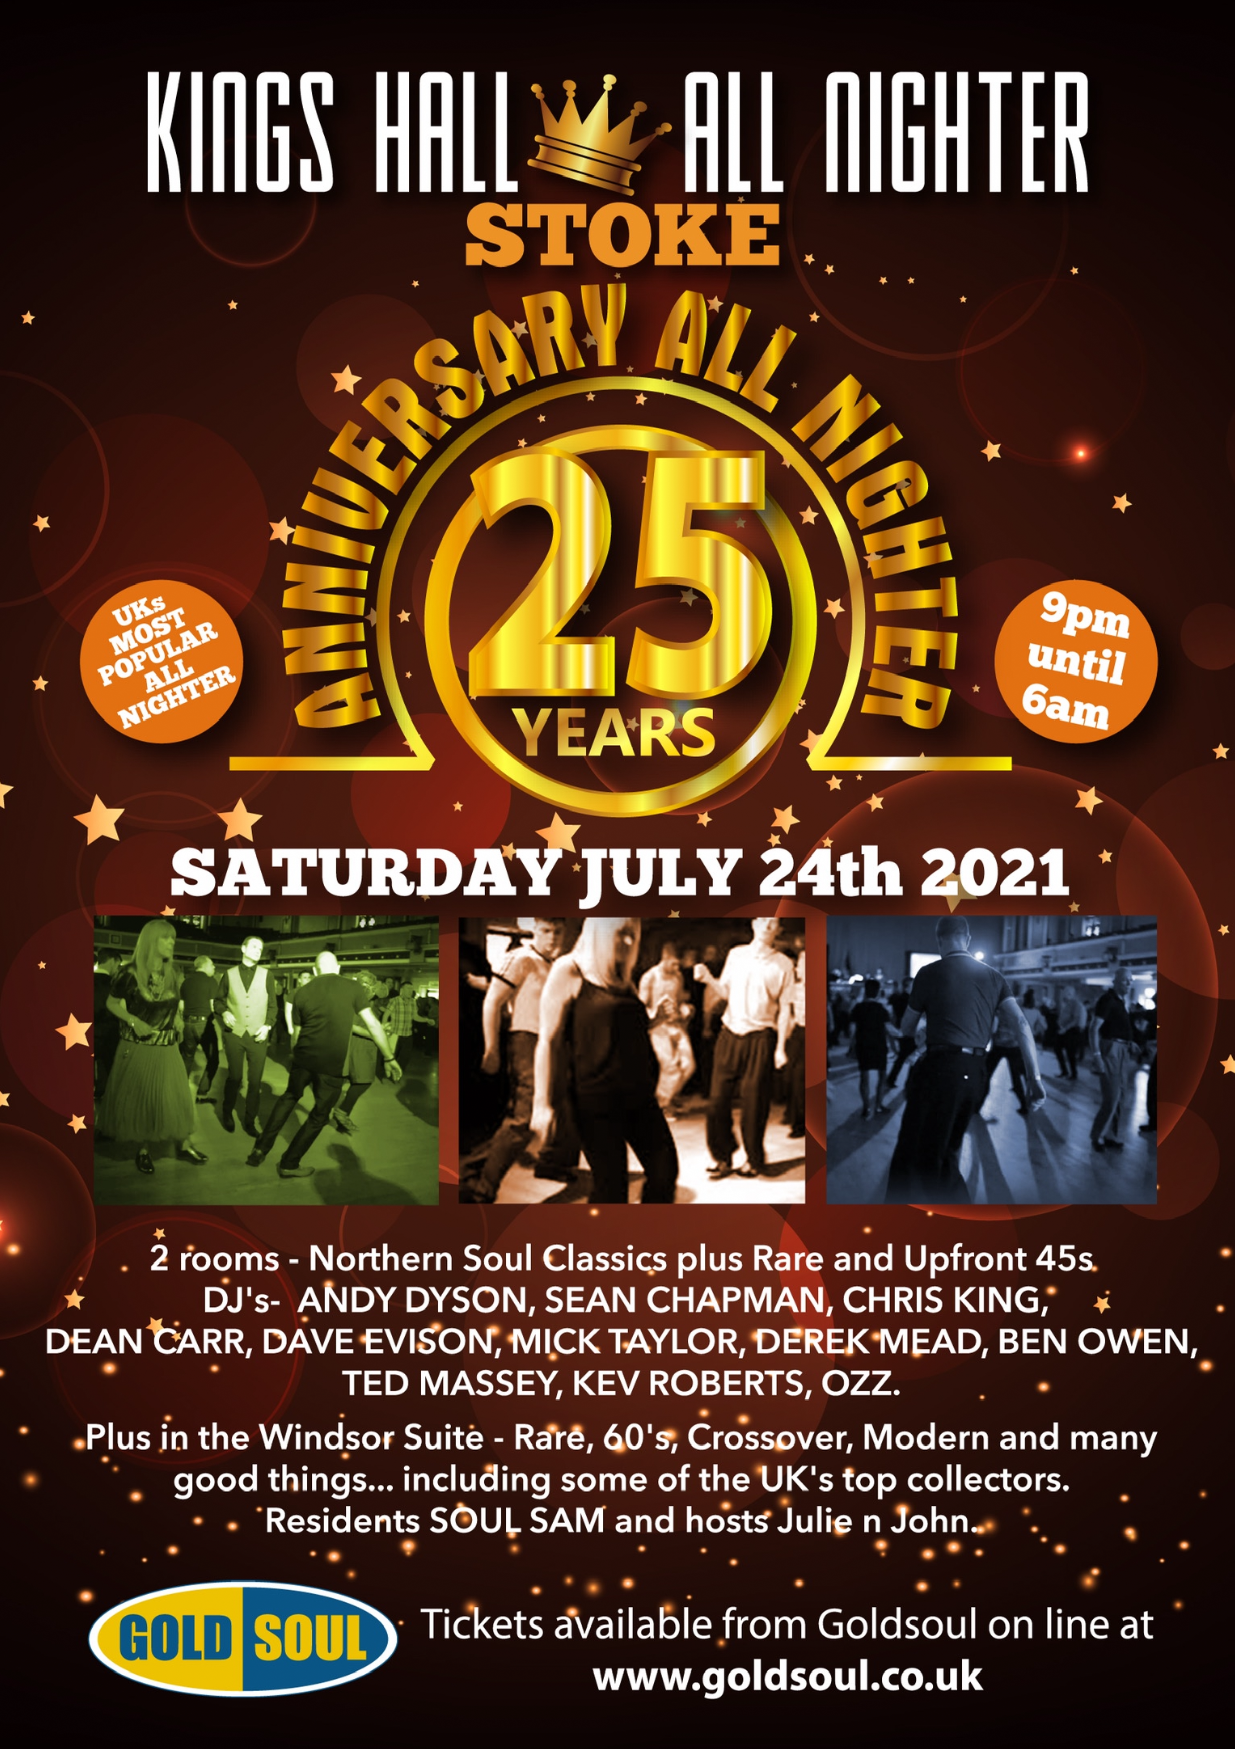 Kings Hall Stoke 25th Anniversary 19962021 flyer